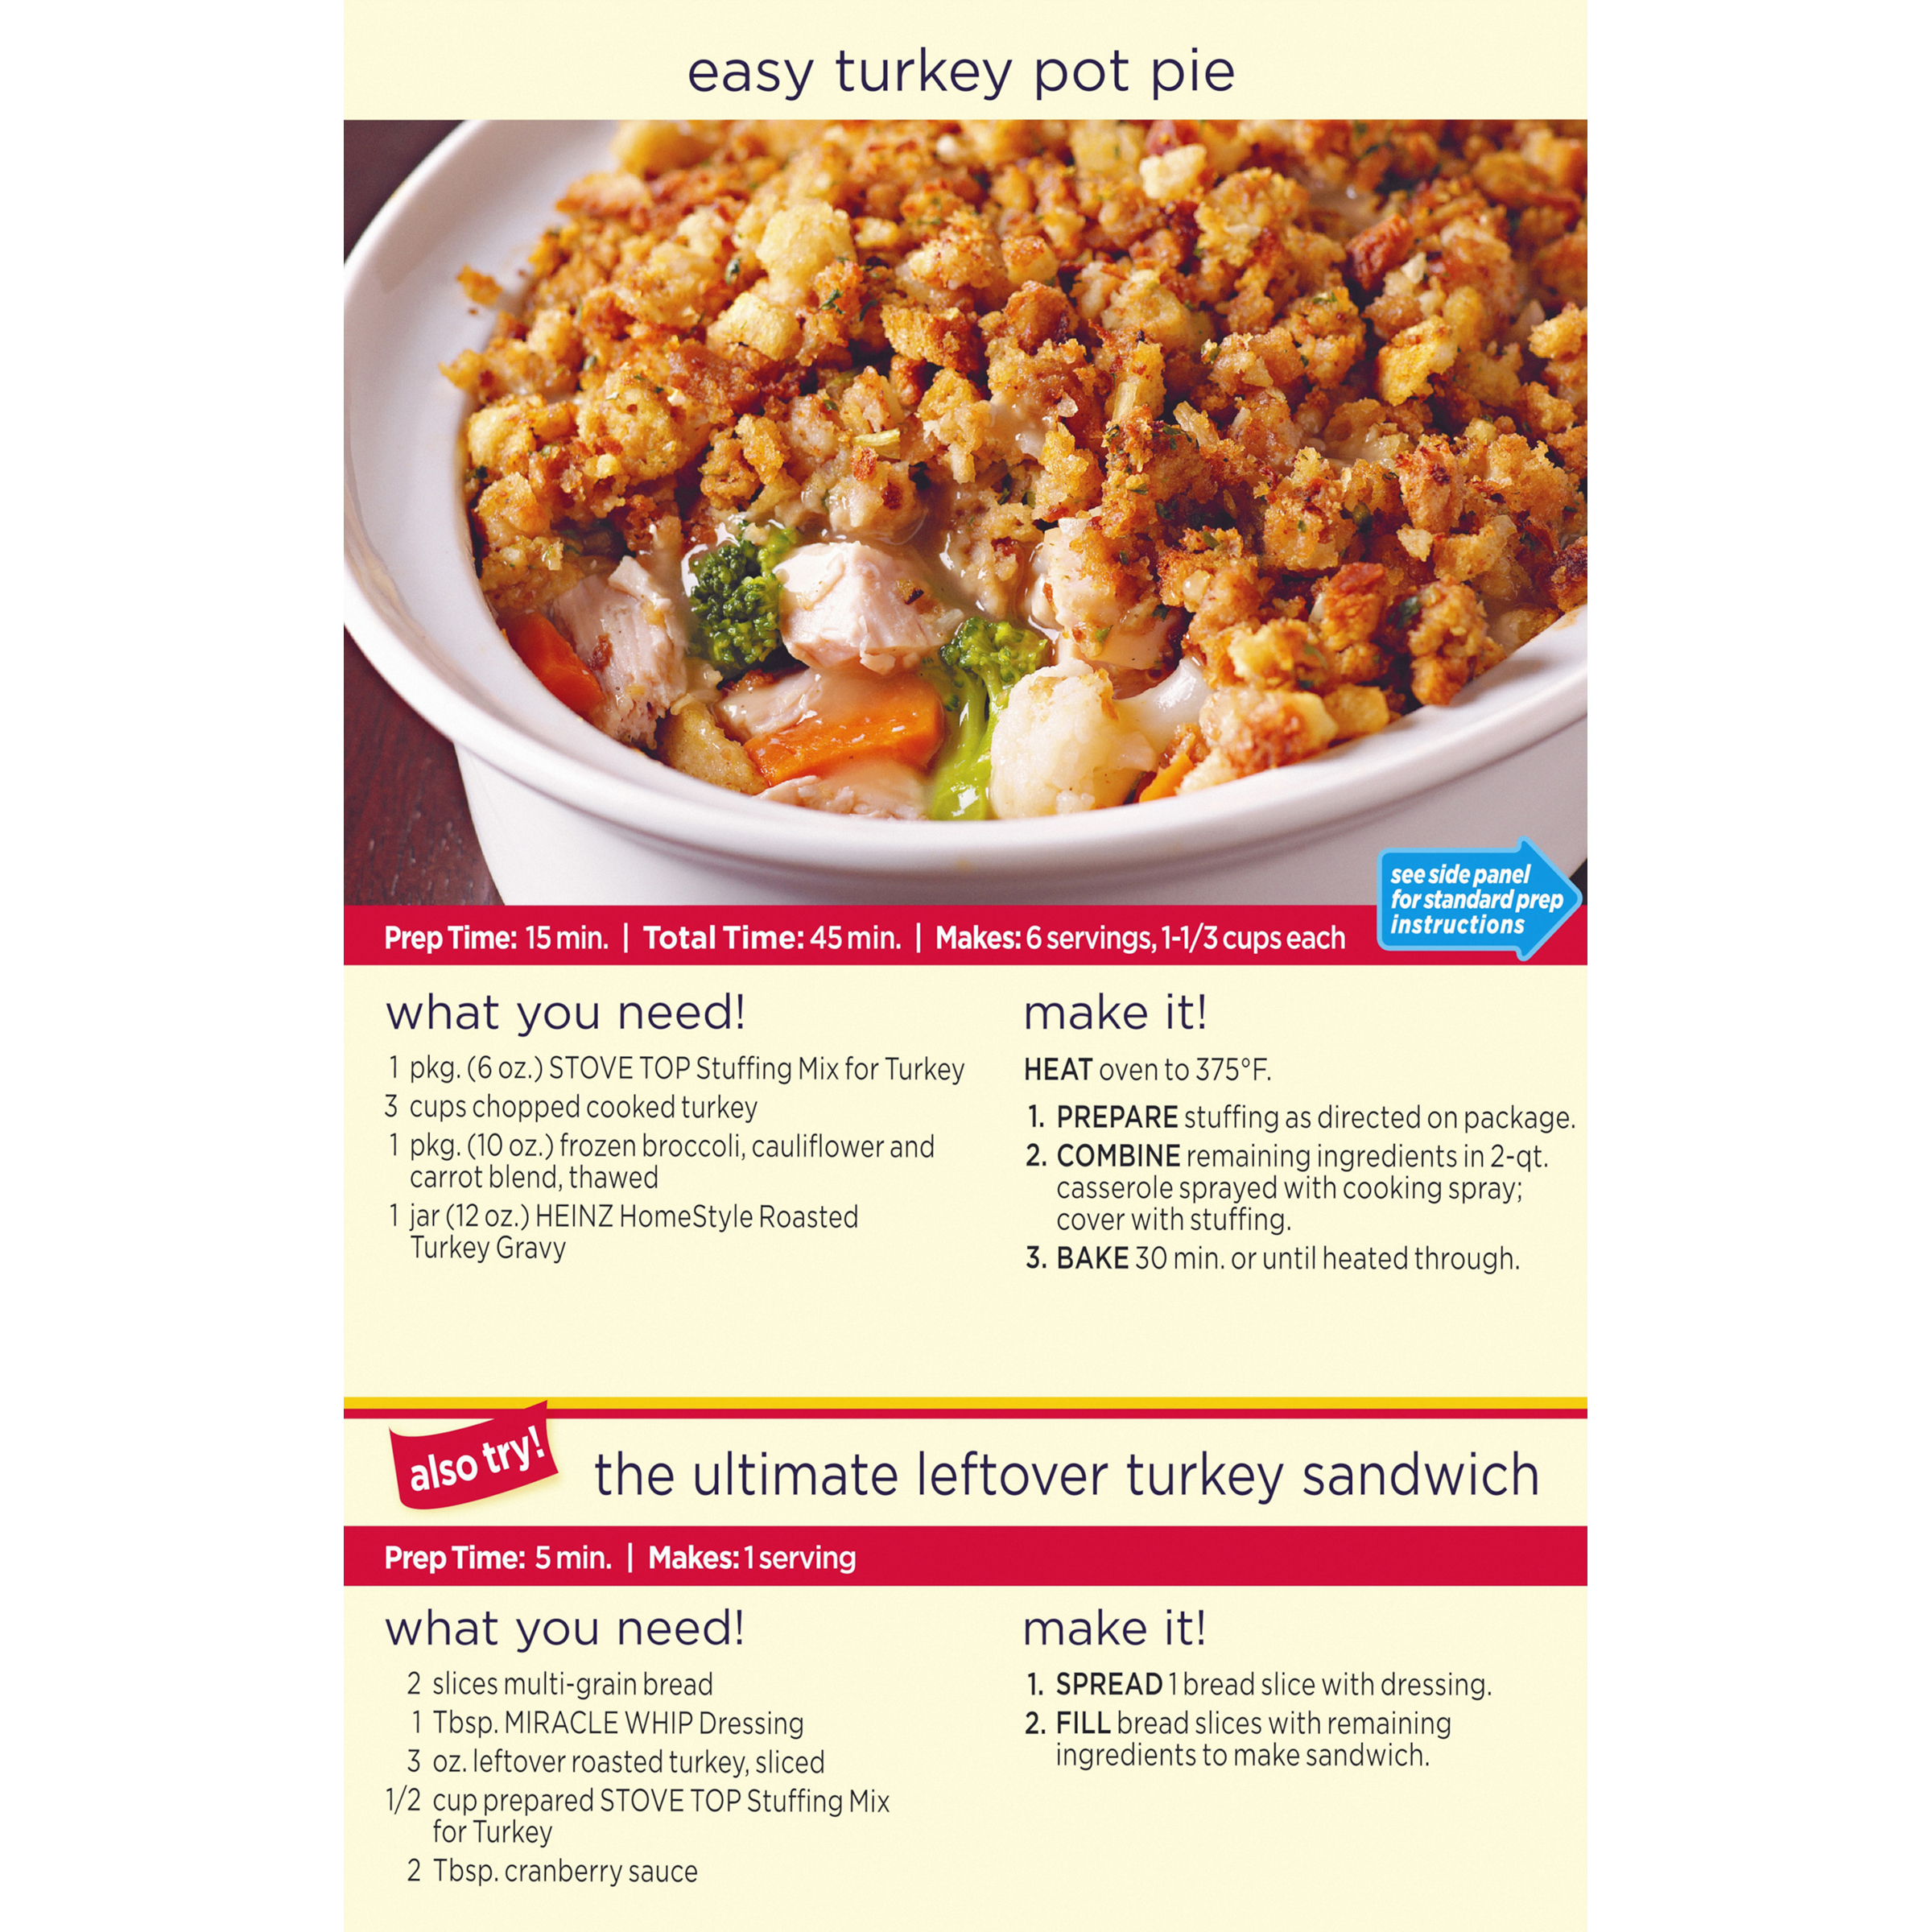 Stove Top Turkey Stuffing Mix, 6 oz Box